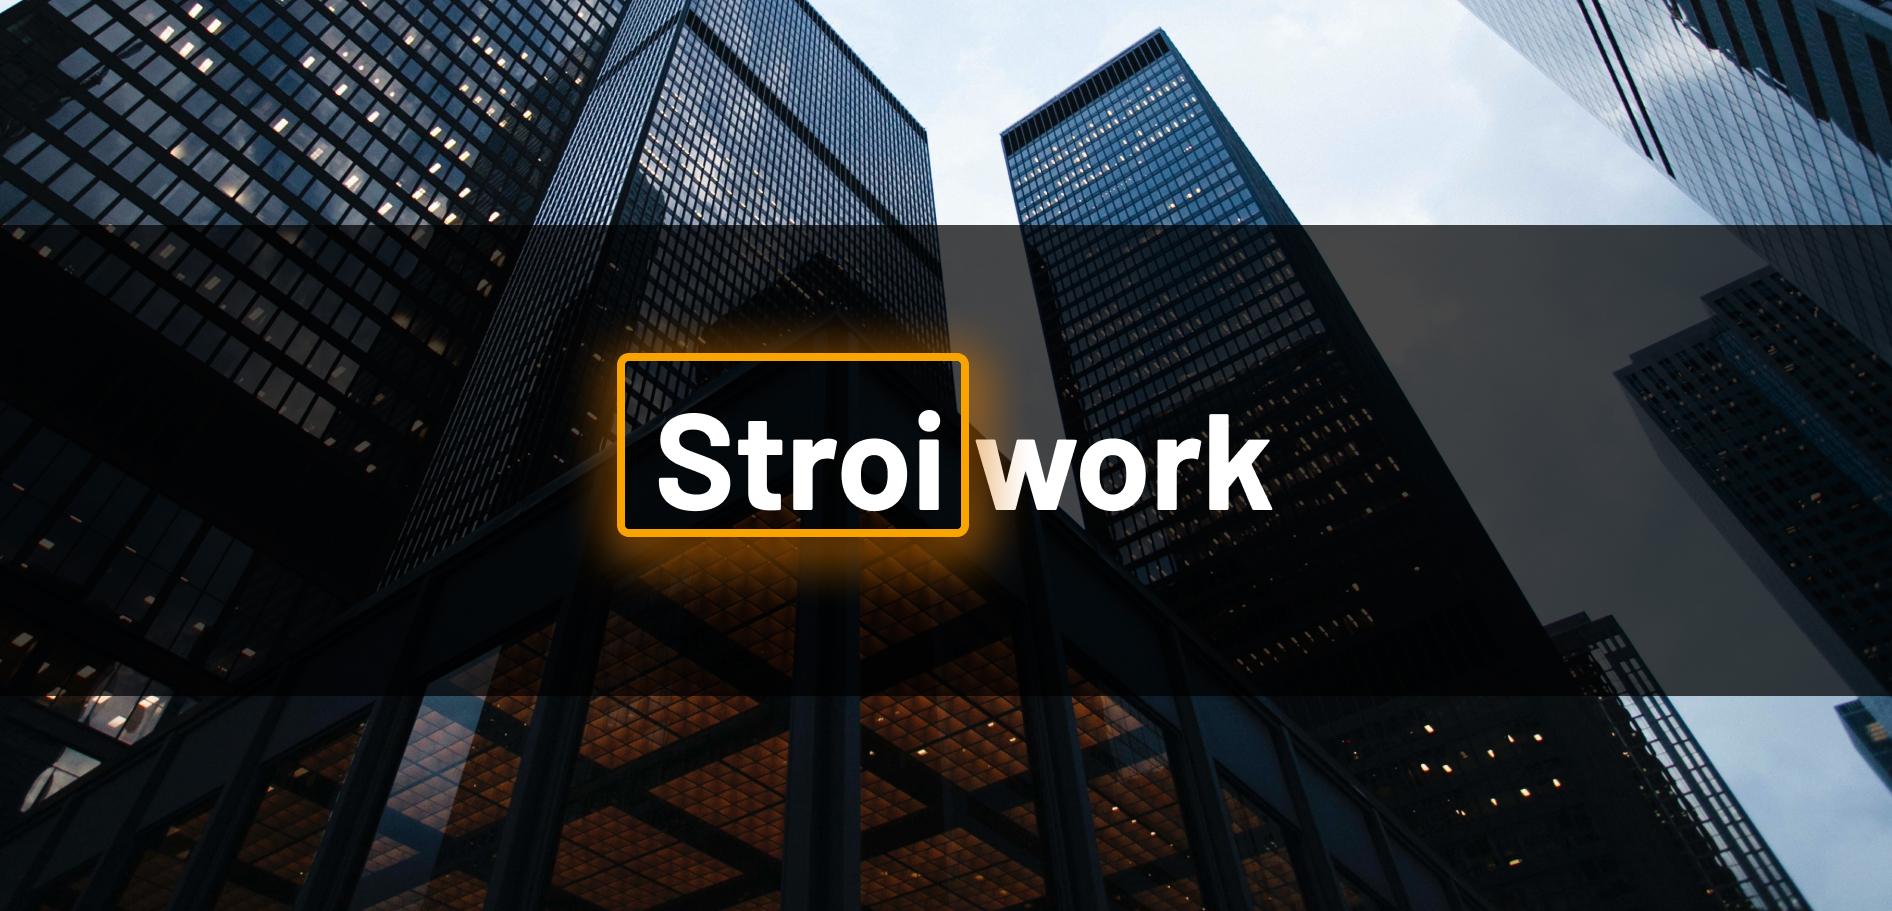 Удалённая работа орёл свежие вакансии freelancer world